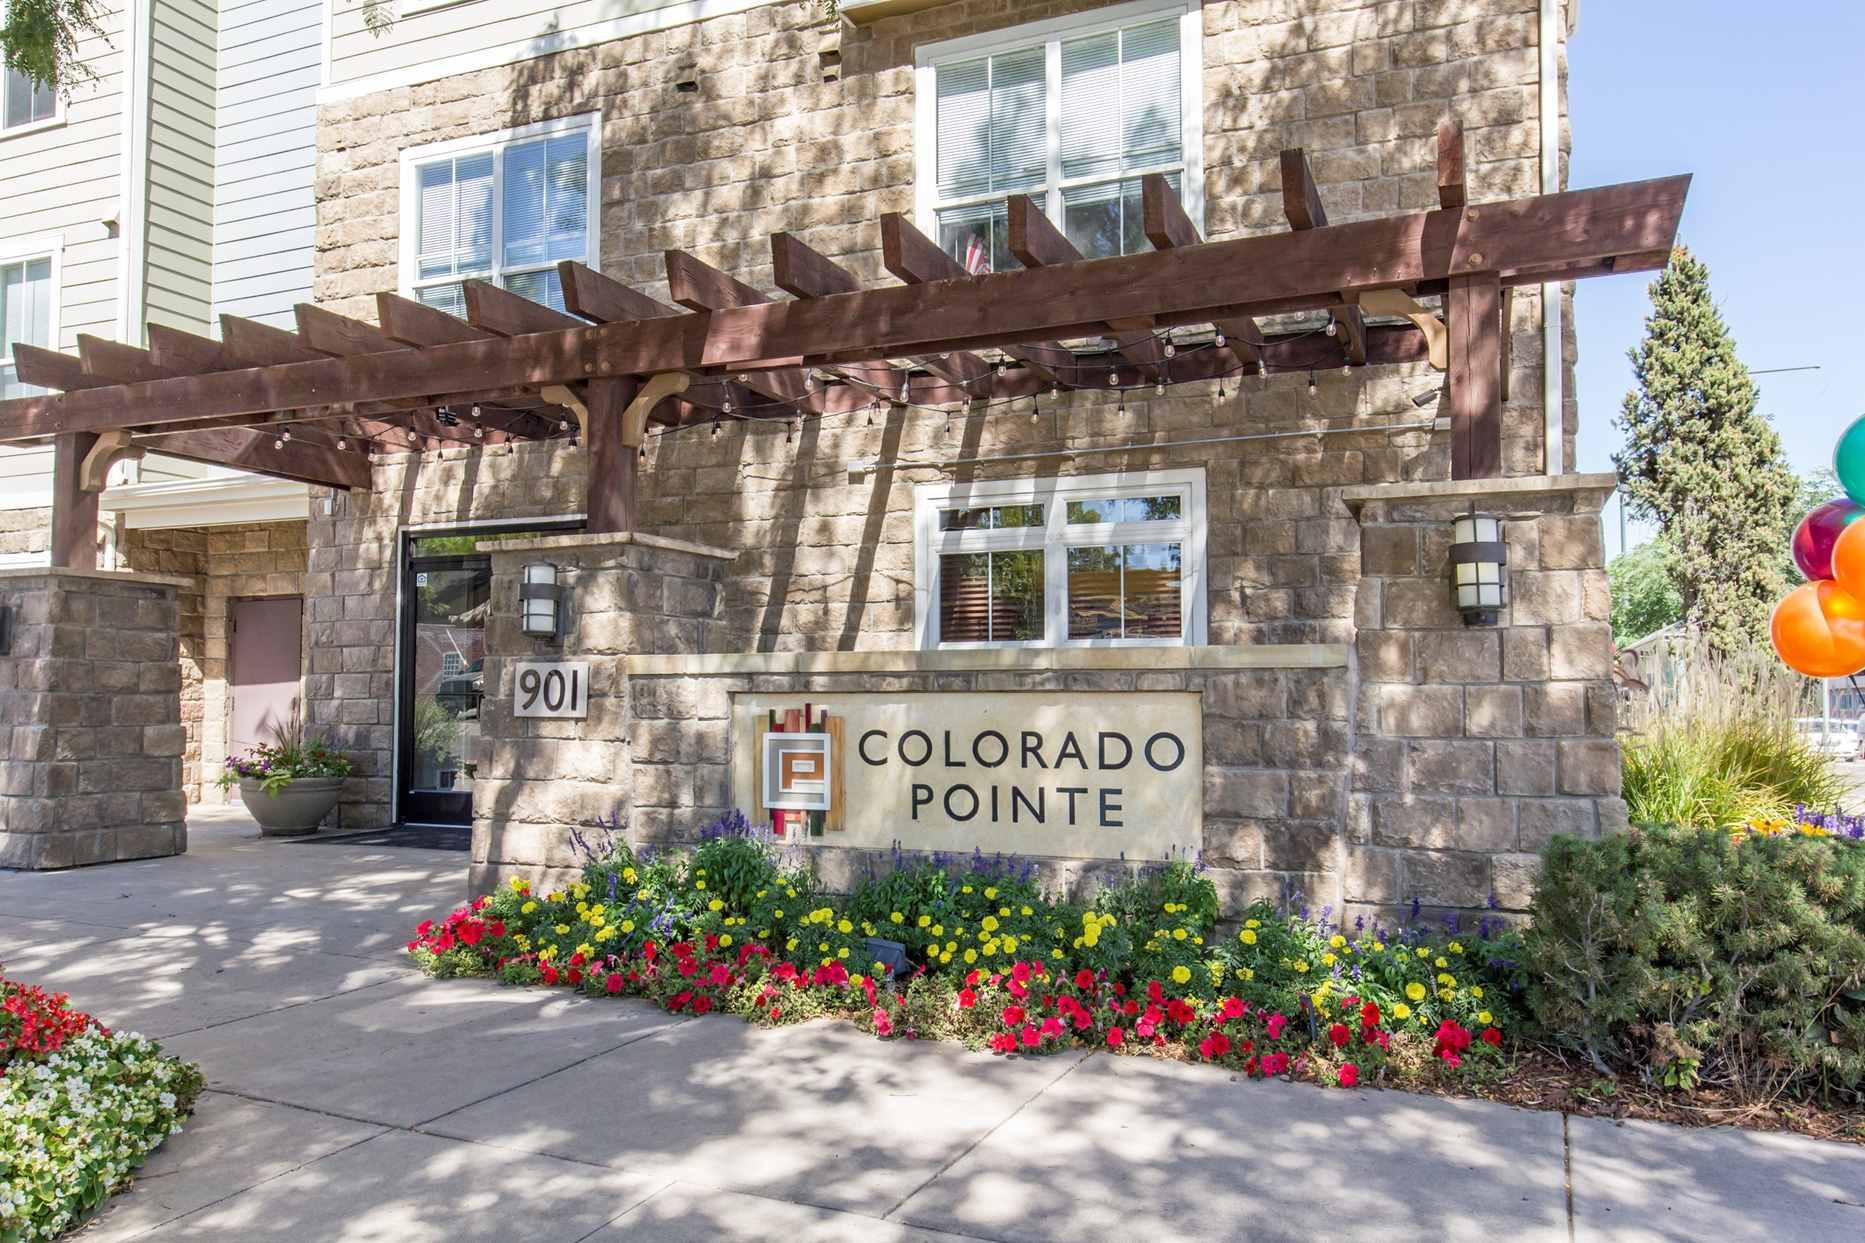 Colorado Pointe Apartments for rent